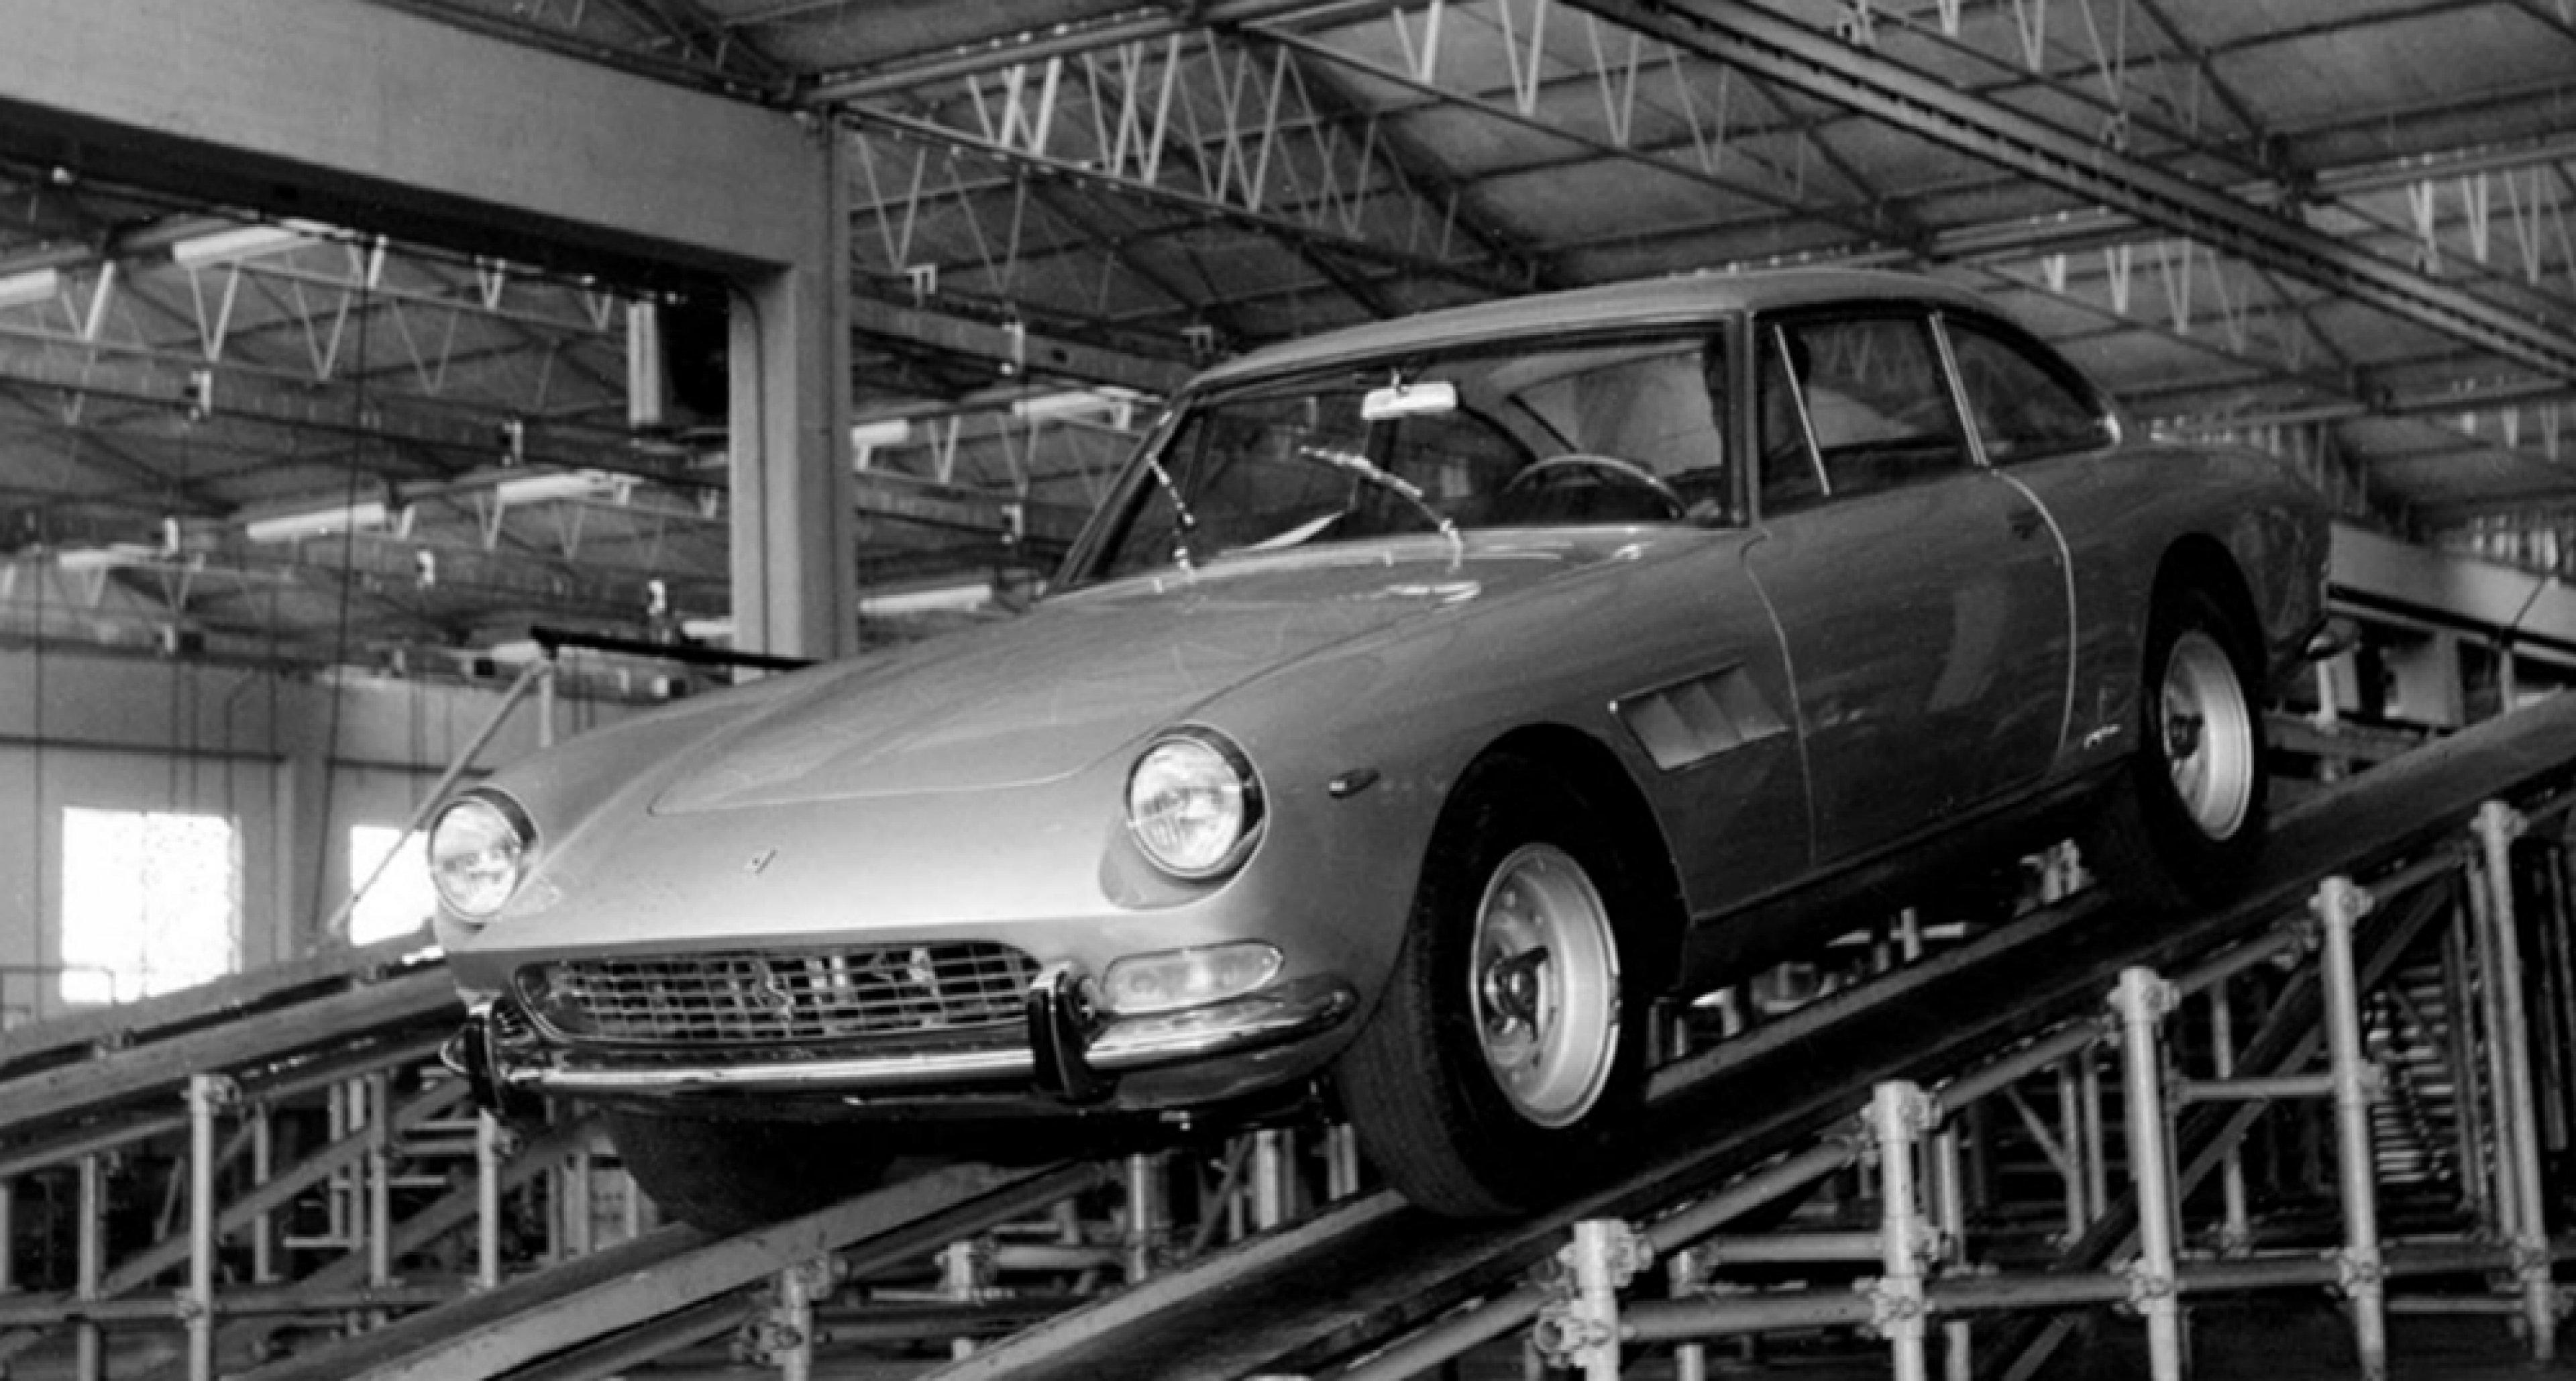 The beautiful Ferrari 330 GT 2+2